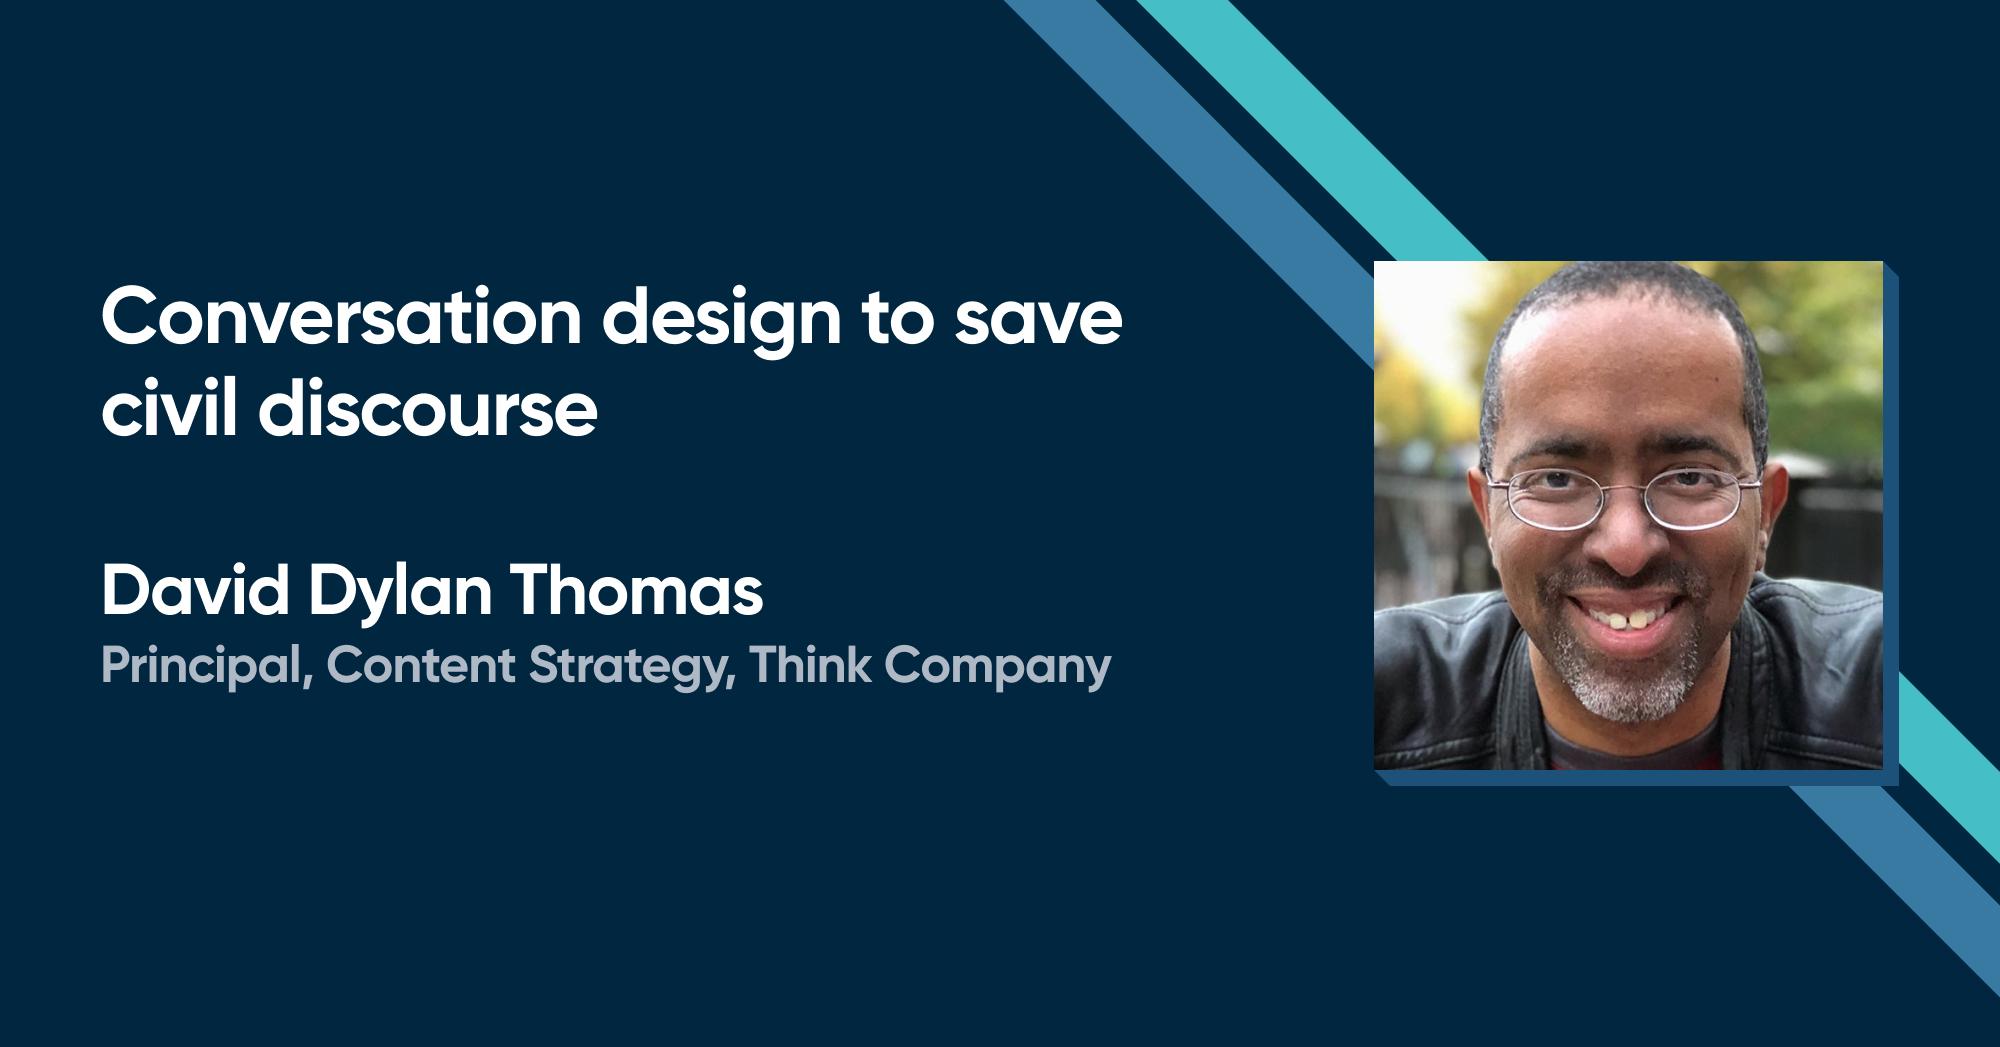 David Dylan Thomas - Conversation design to save civil discourse